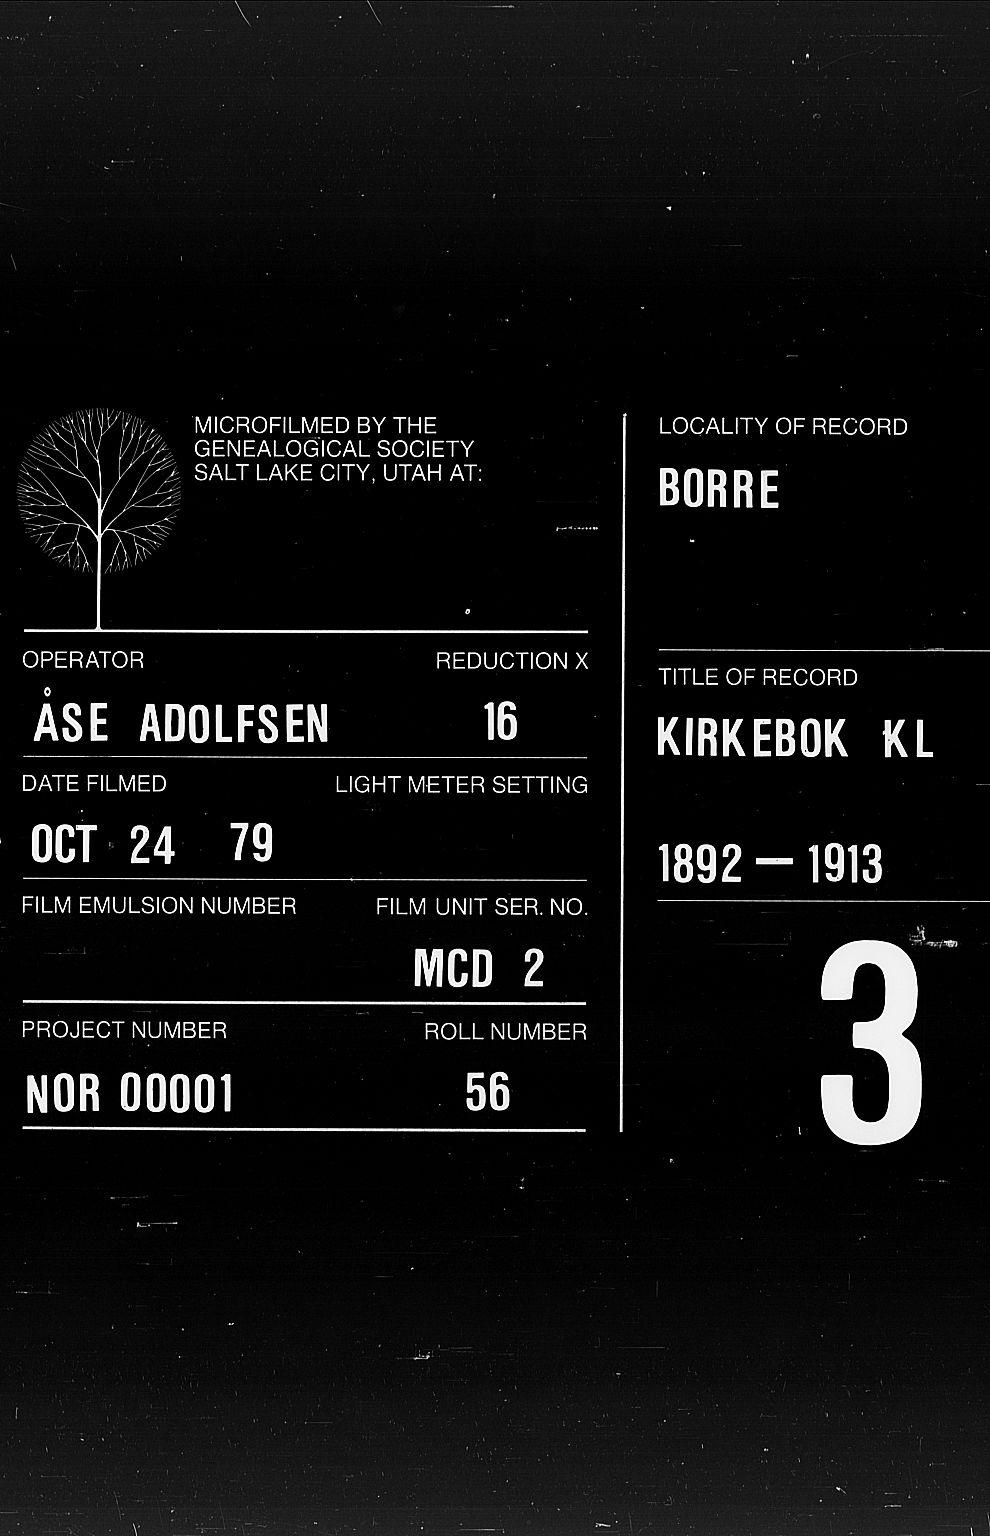 SAKO, Borre kirkebøker, G/Ga/L0004: Klokkerbok nr. I 4, 1892-1913